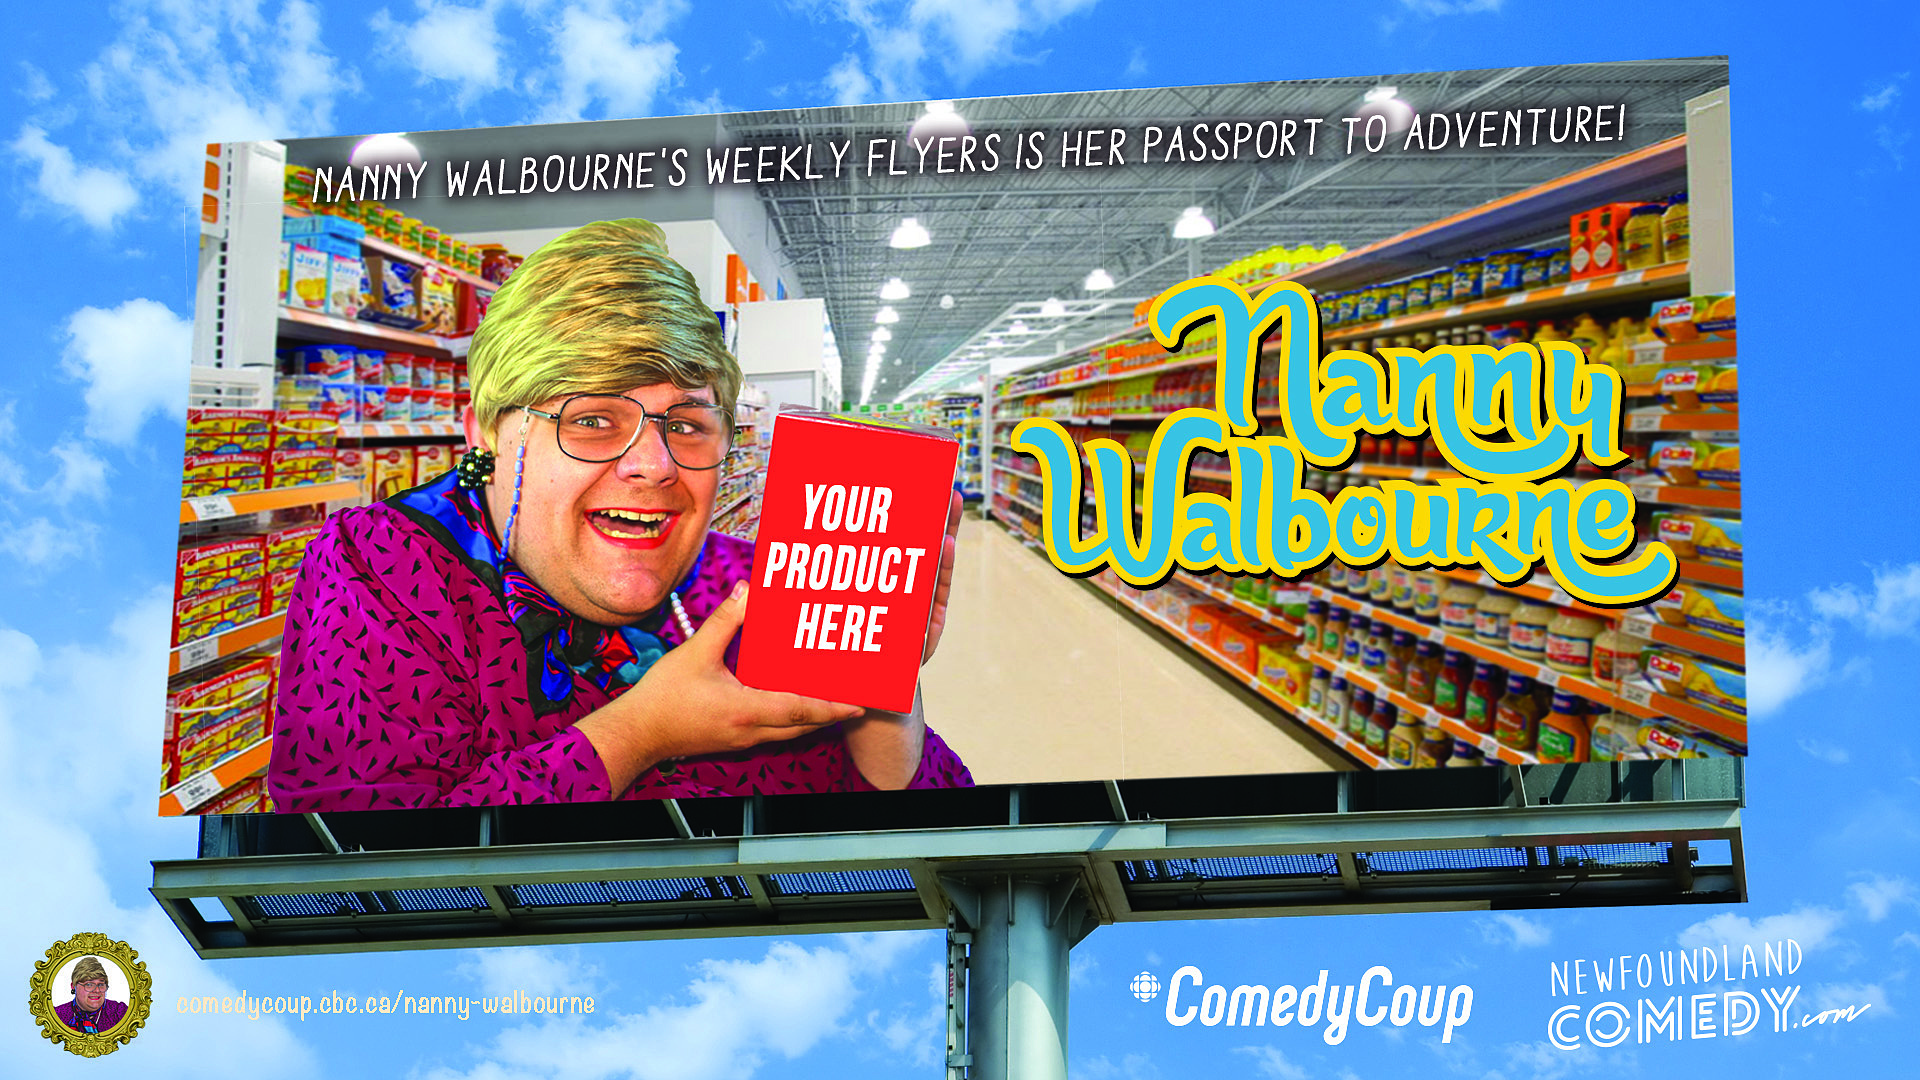 Week 4 Key It: Poster A Nanny Walbourne